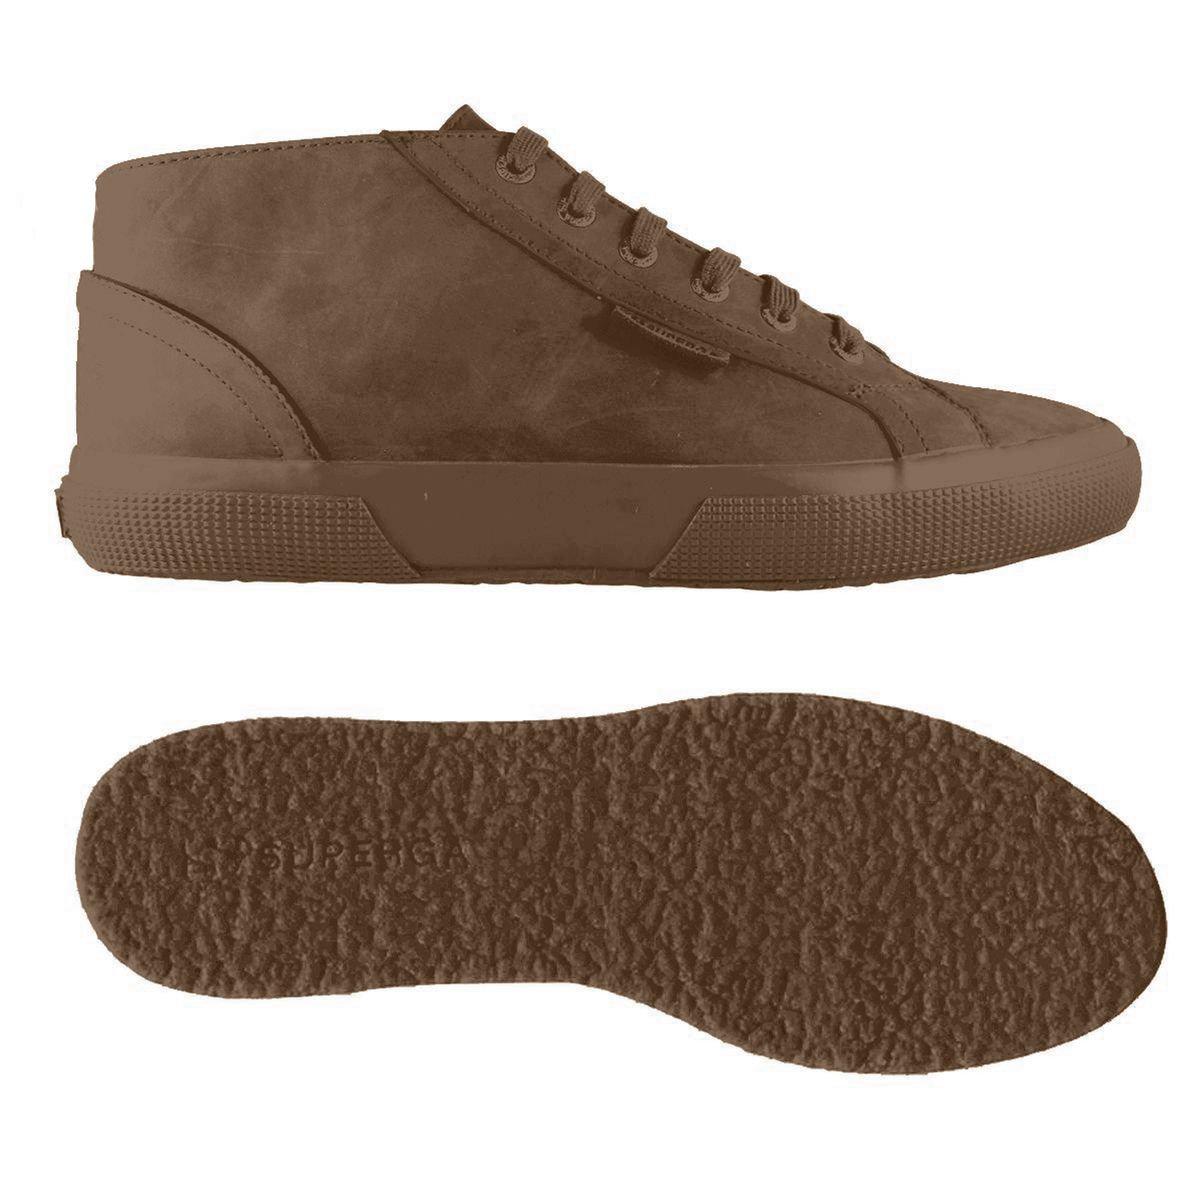 Superga Neri 2095 shoes Amazon sueu lJF1Kc